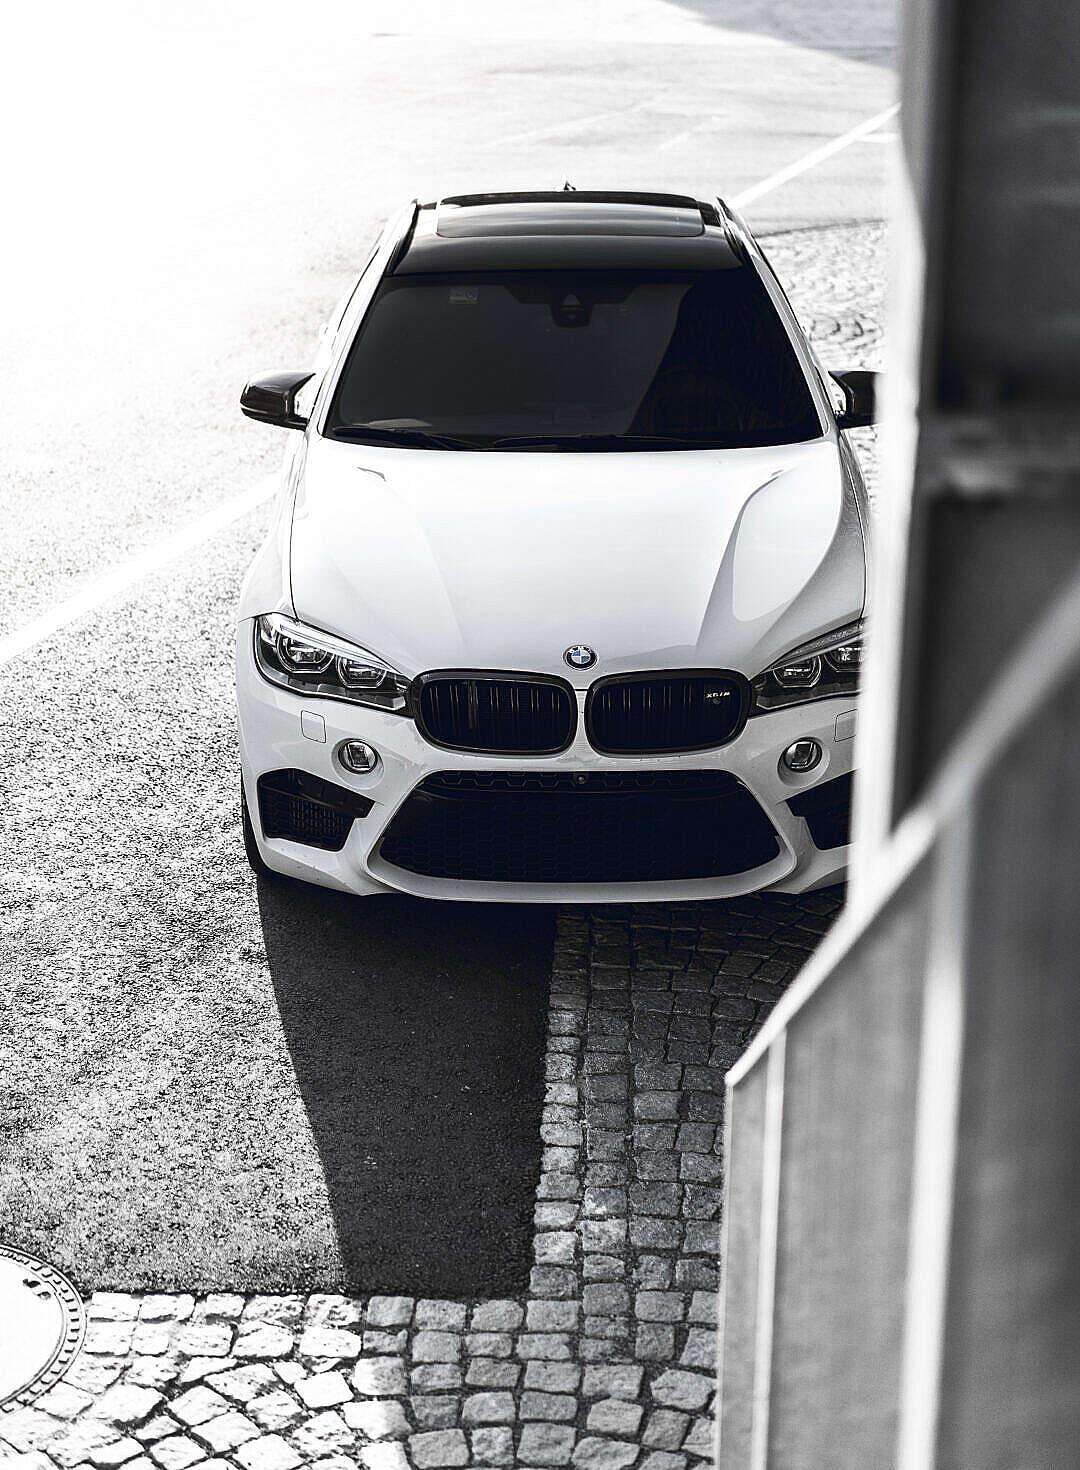 Download BMW X6 M F86 iPhone Wallpaper FREE Stock Photo